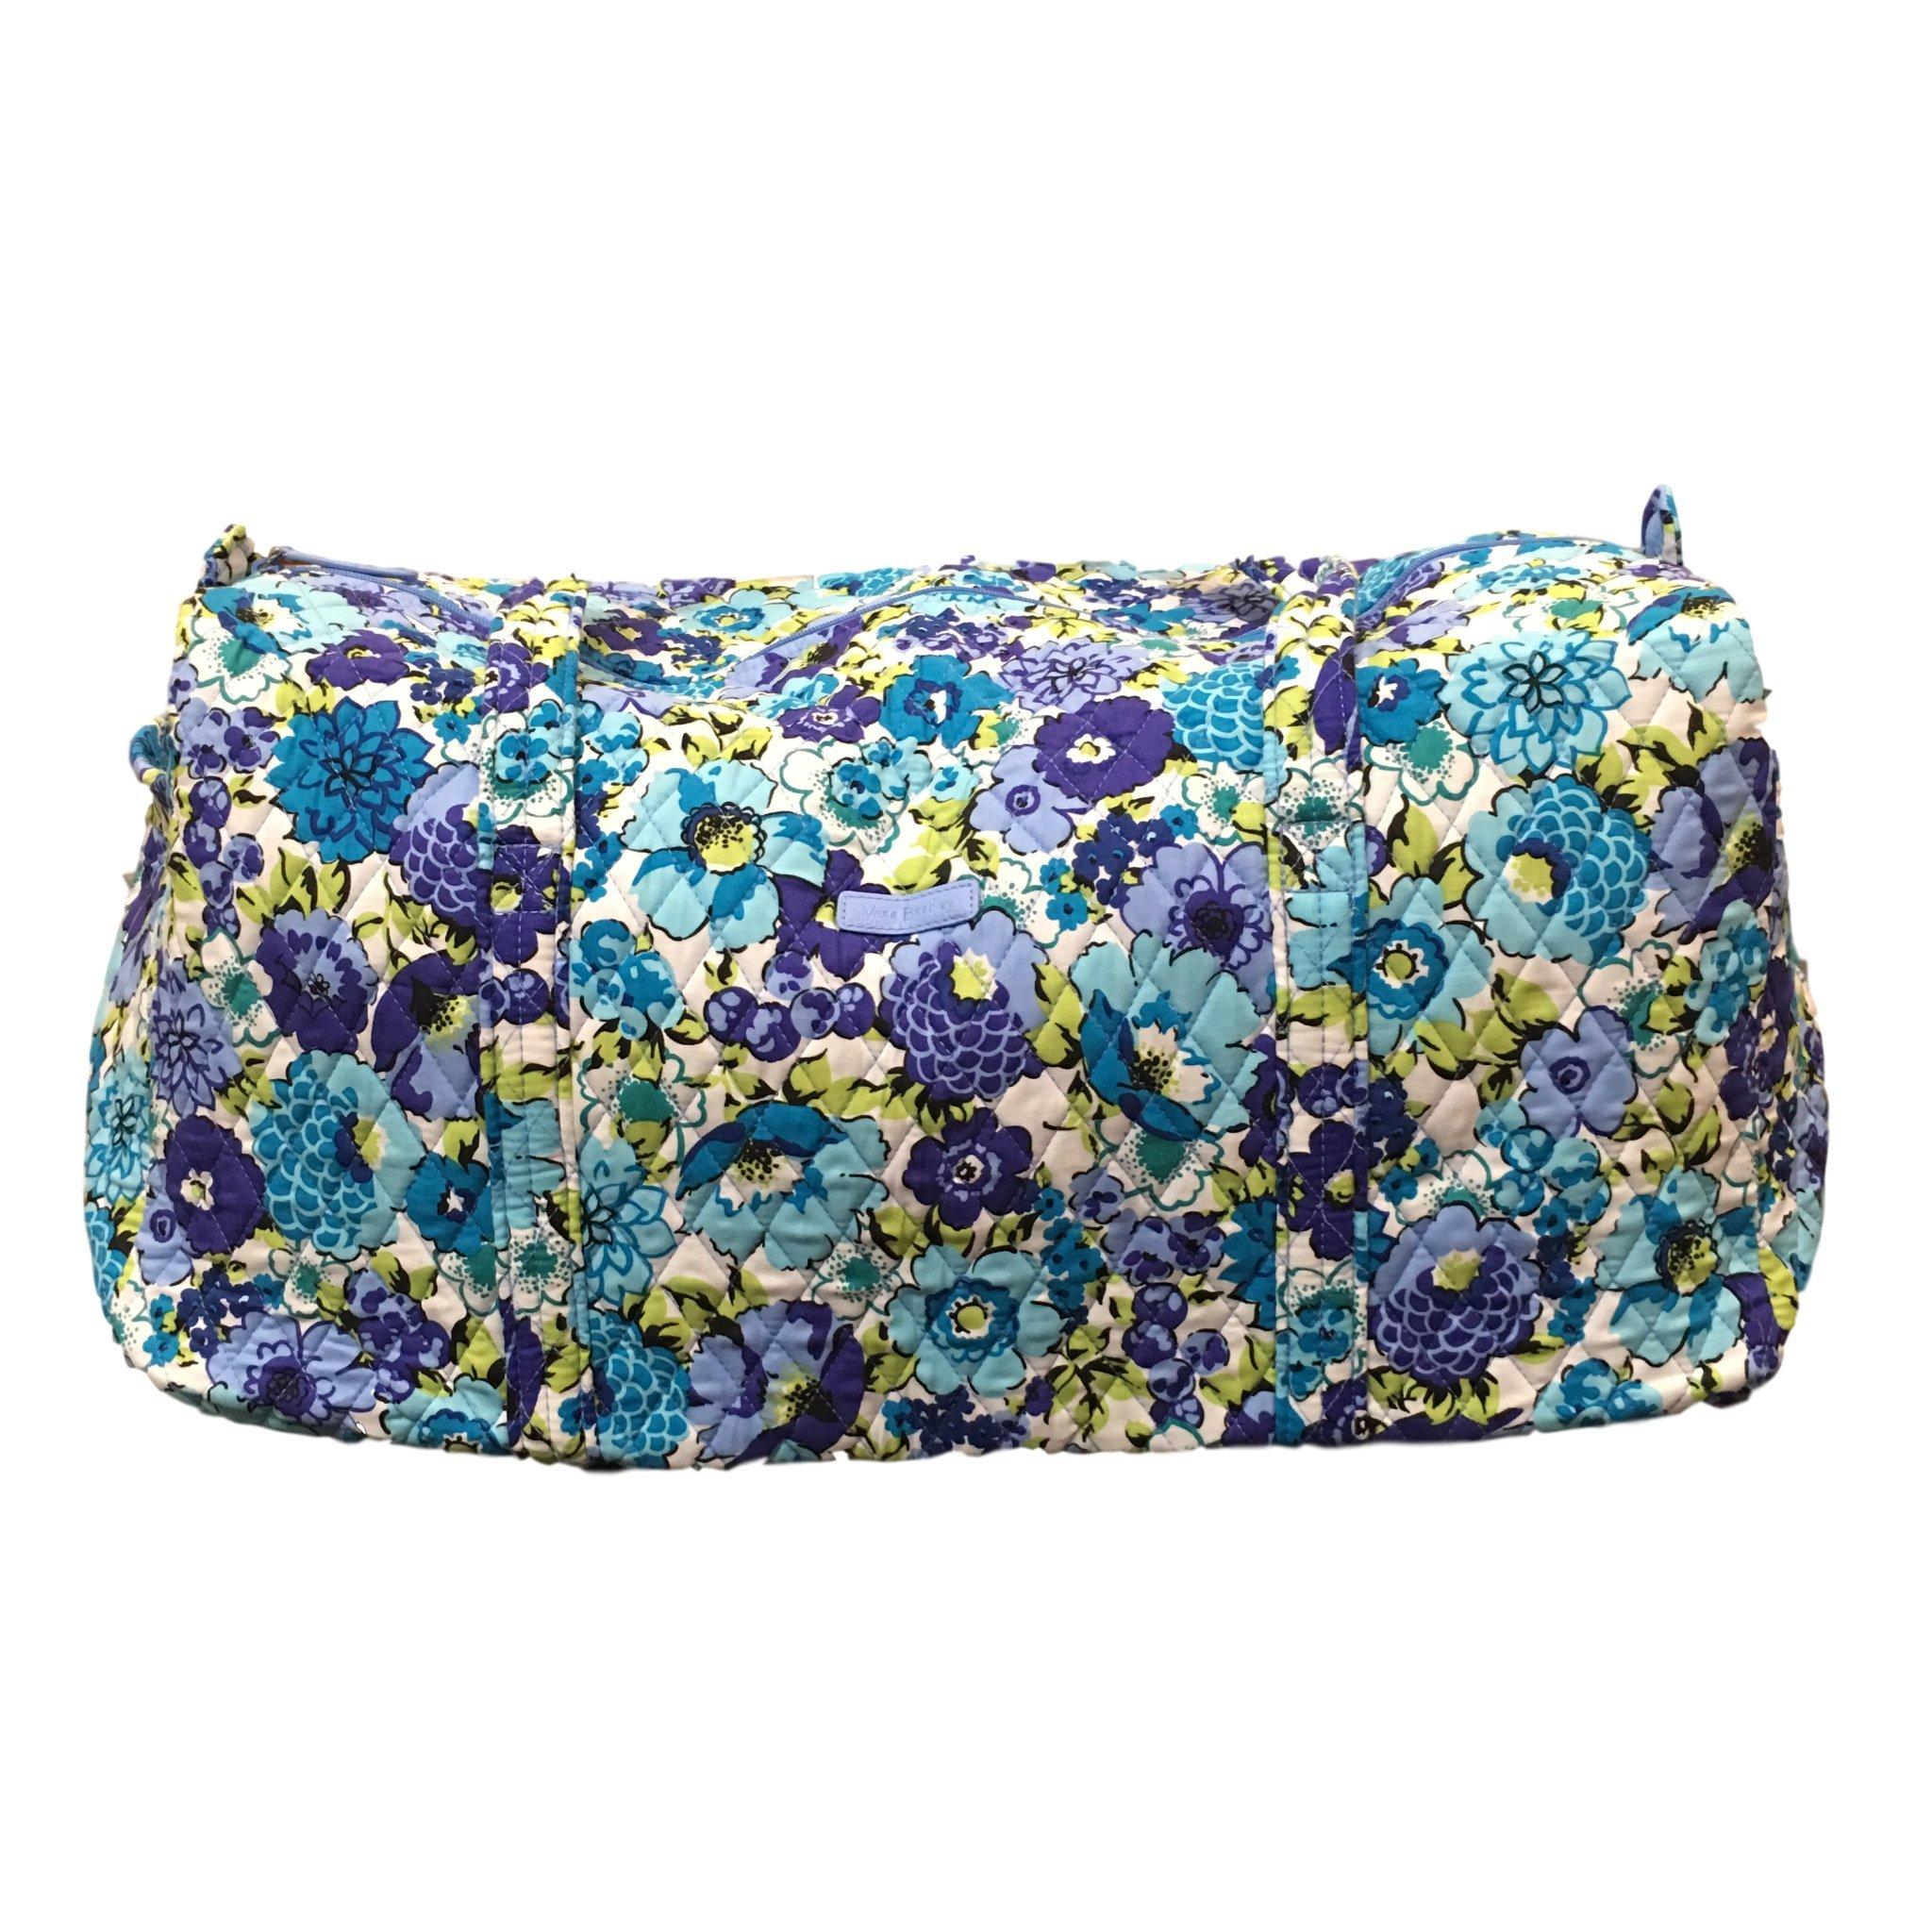 Vera Bradley Large Duffel Bag (Blueberry Blooms)